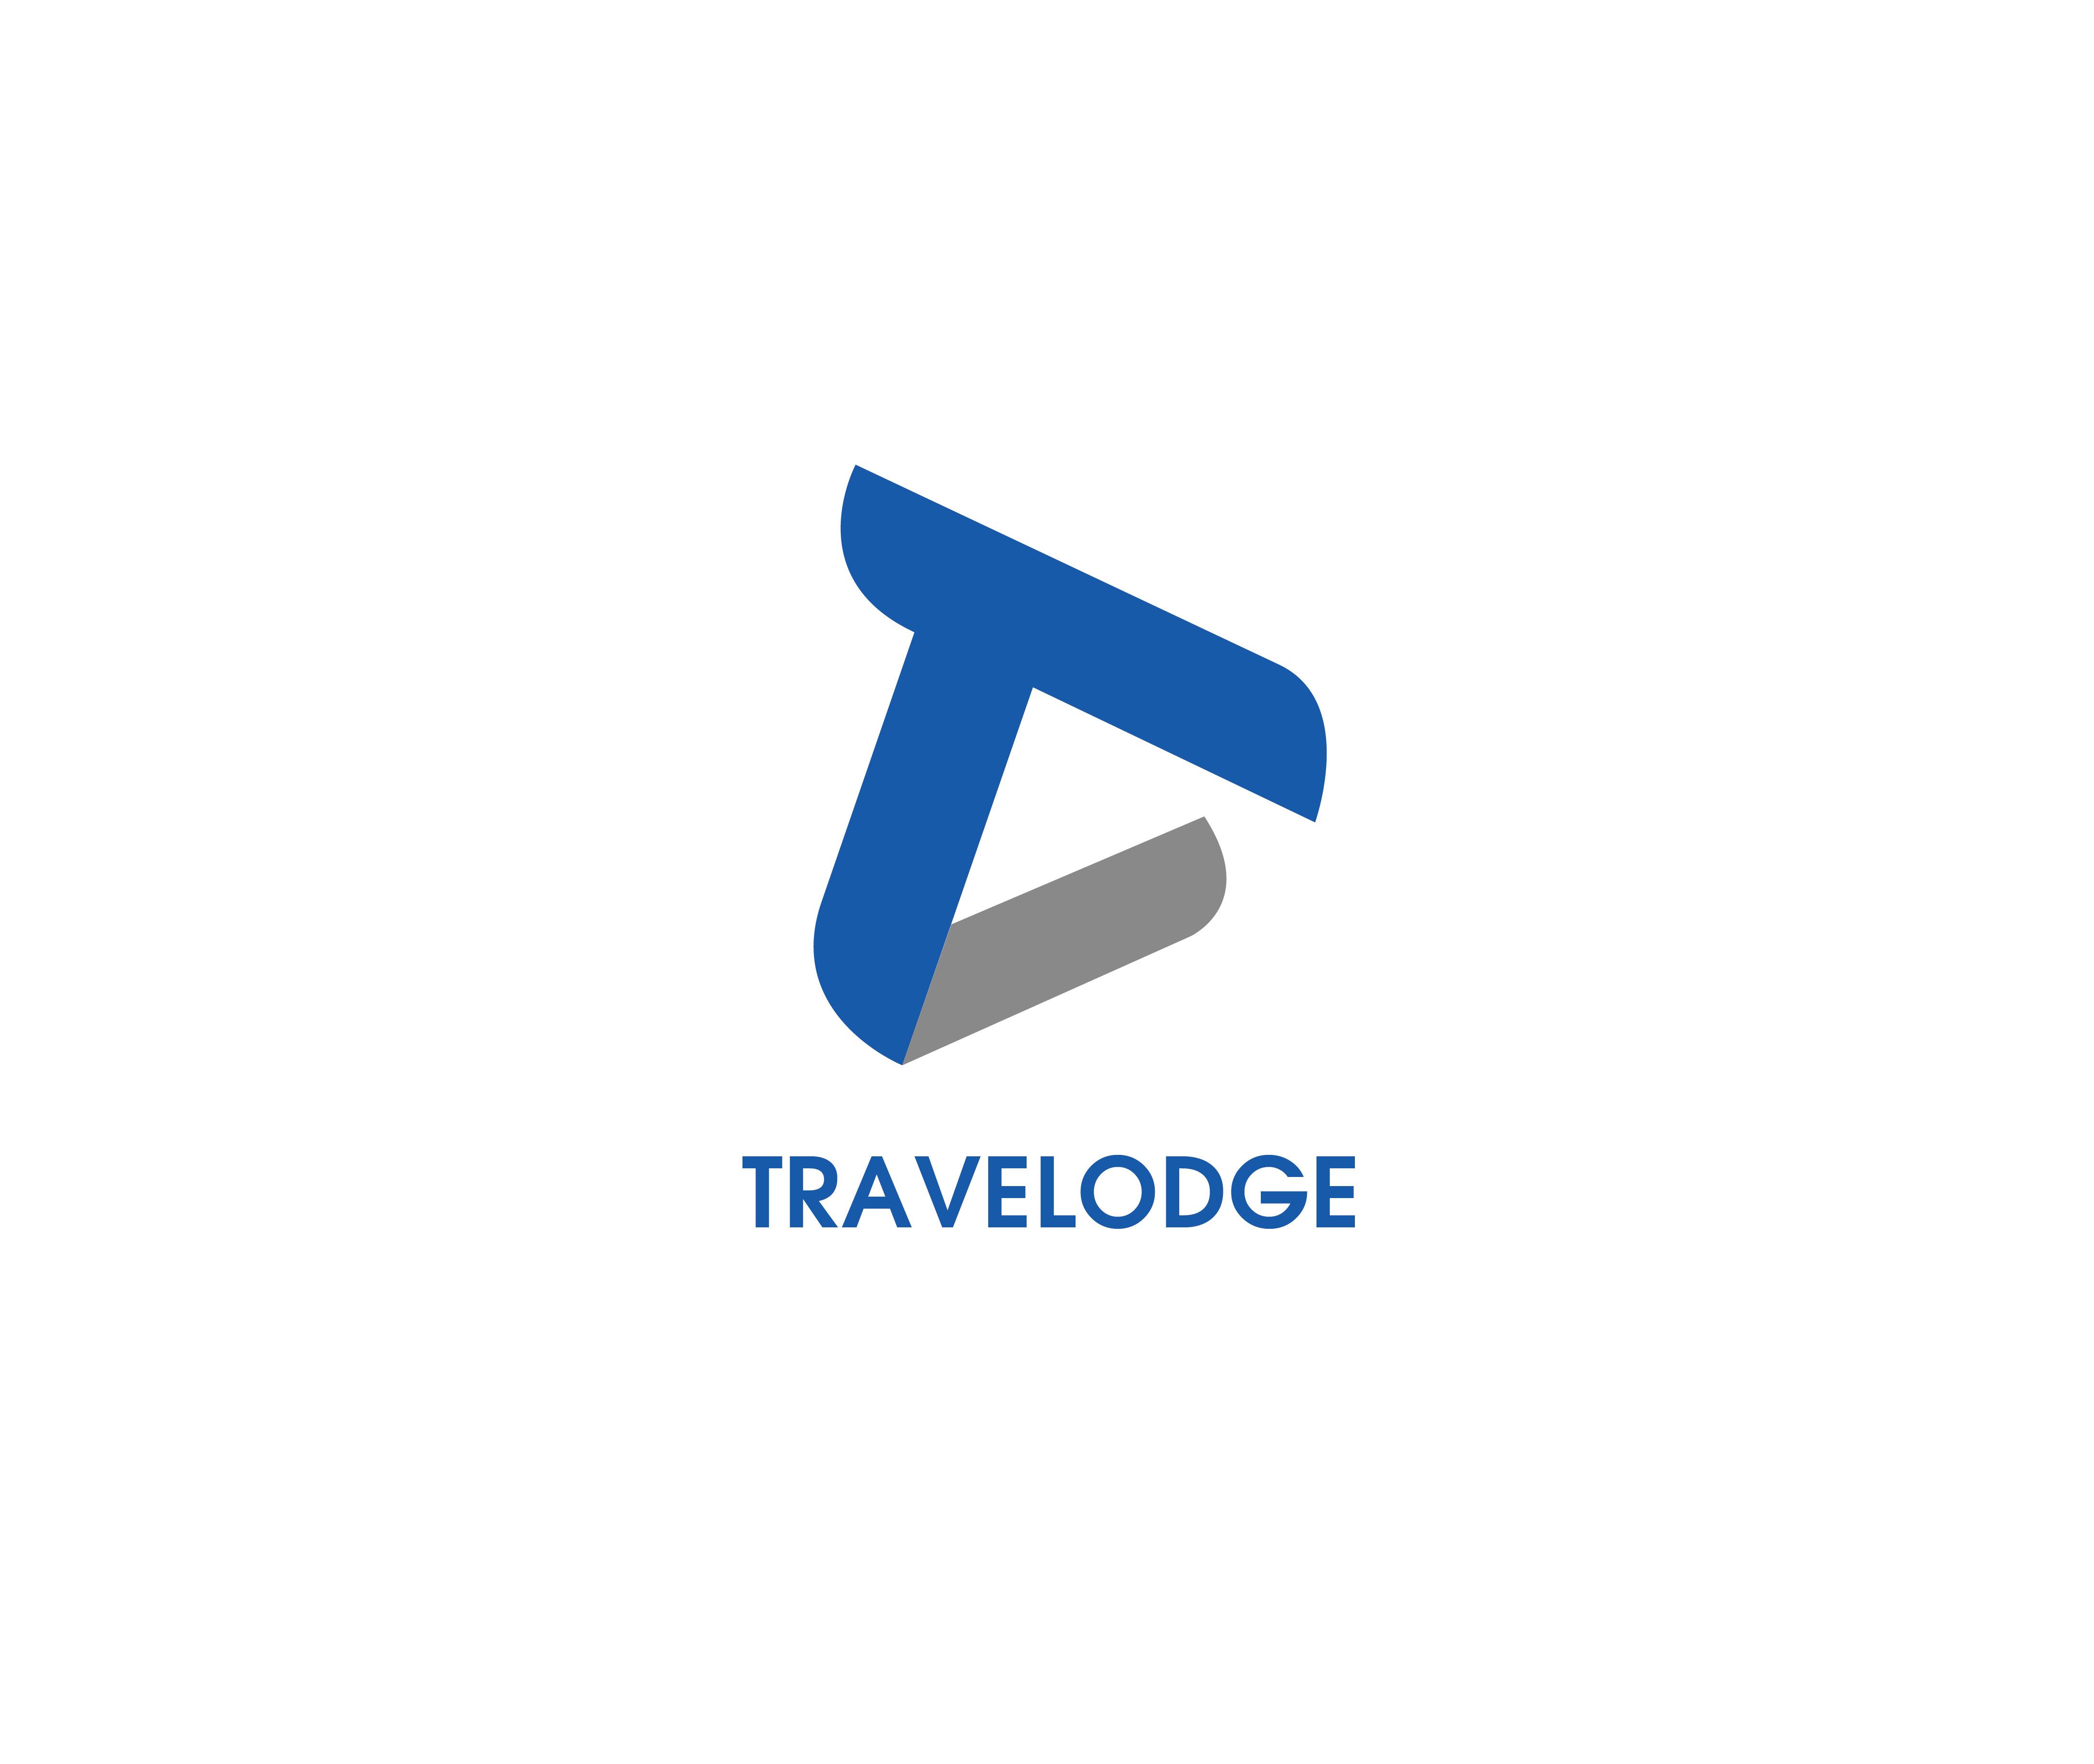 TRAVELODGE (HOTEL REBRANDING)